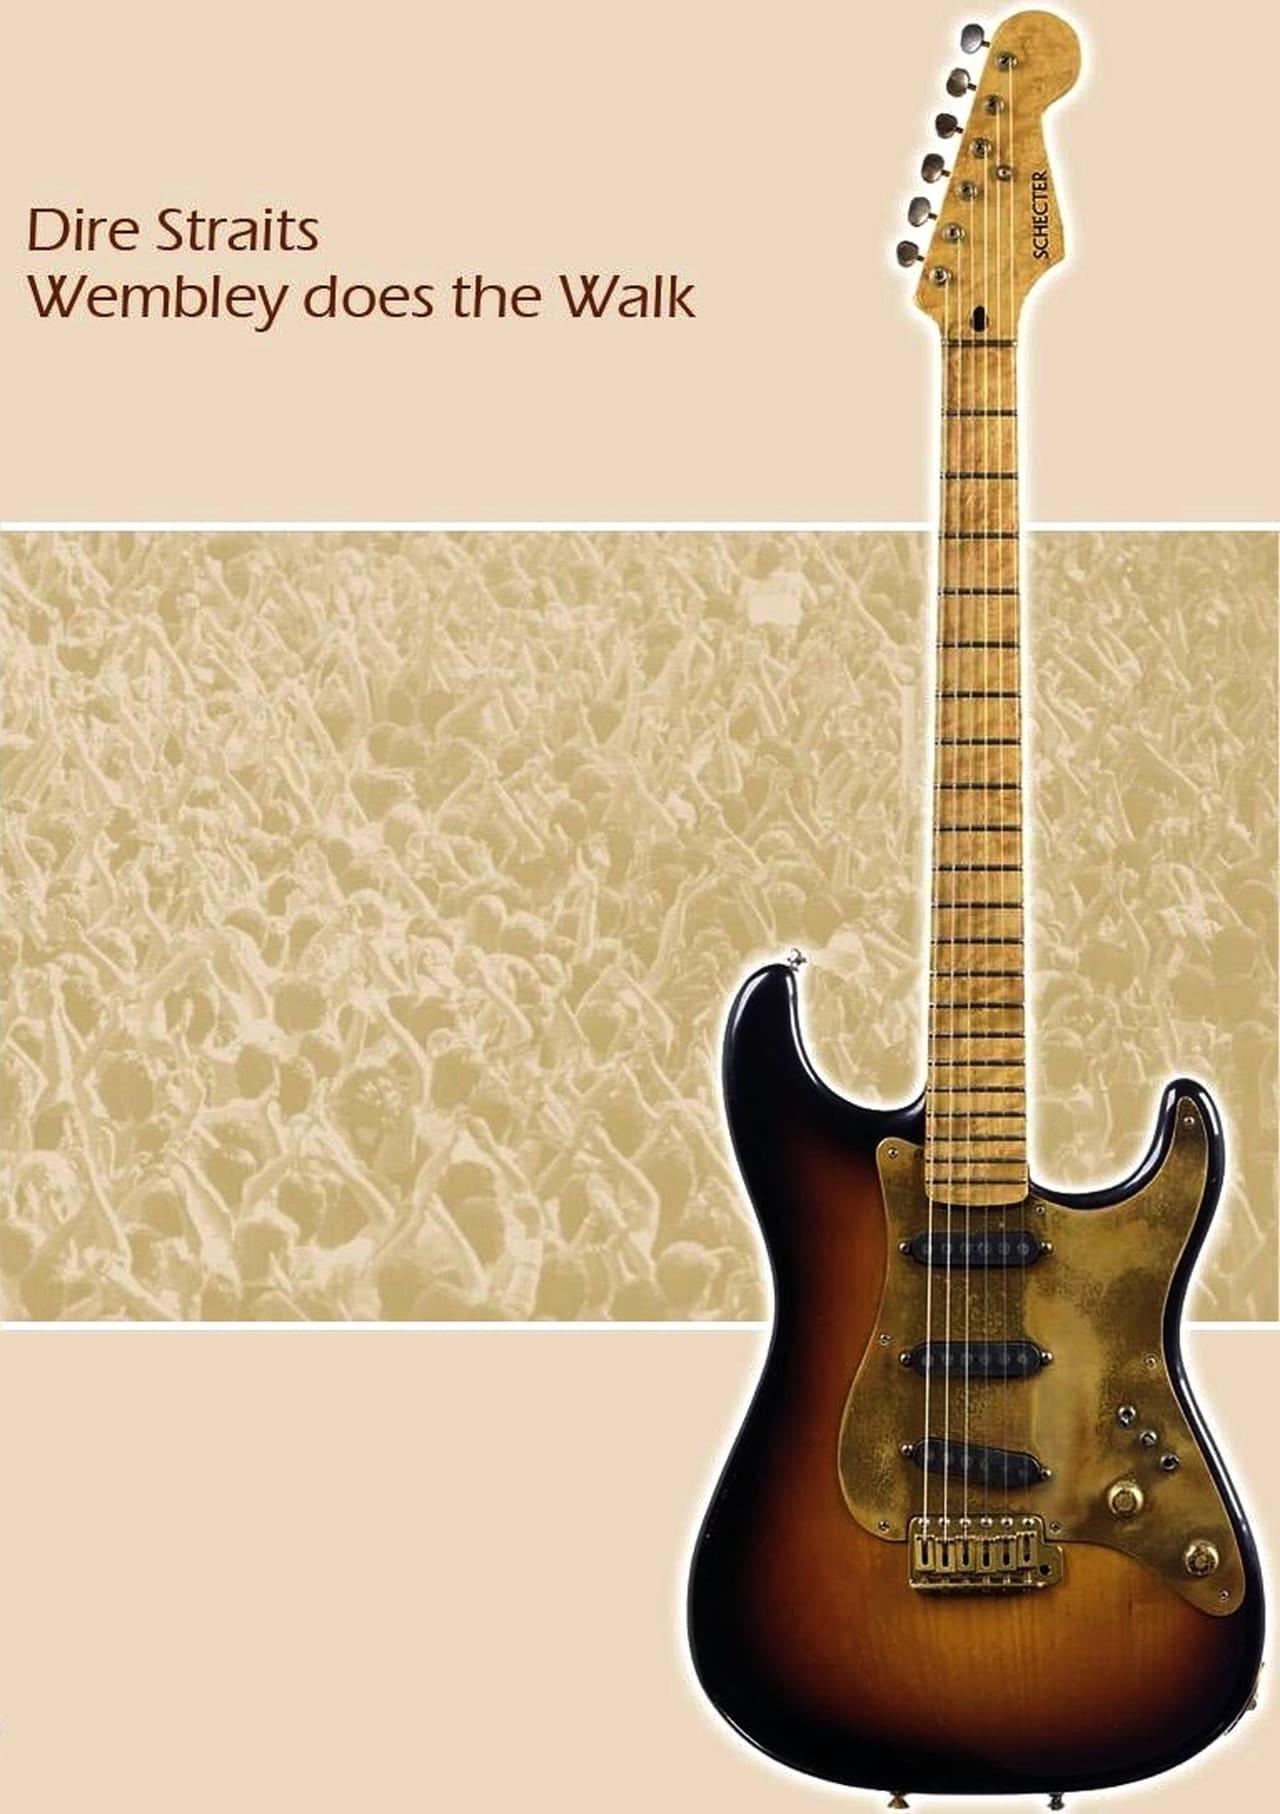 Dire Straits: Wembley Does The Walk